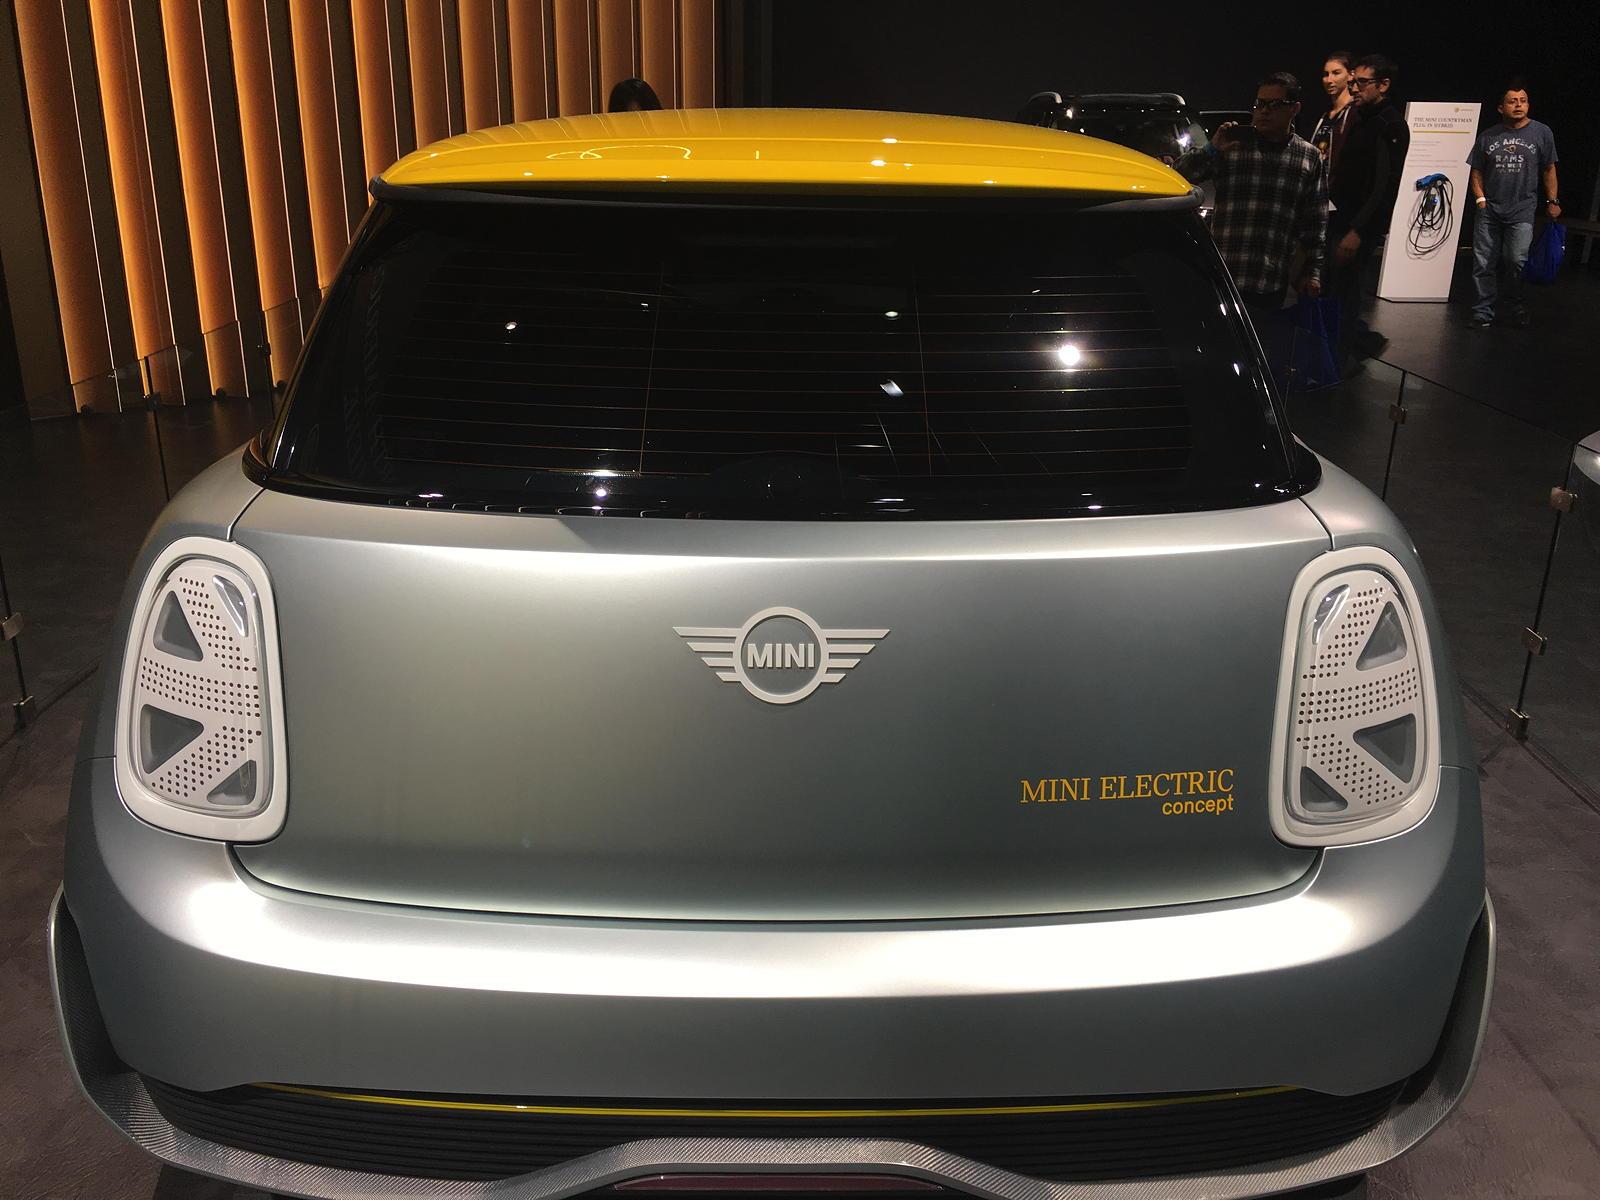 mini electric concept car at la auto show georgeco specr53 blog. Black Bedroom Furniture Sets. Home Design Ideas